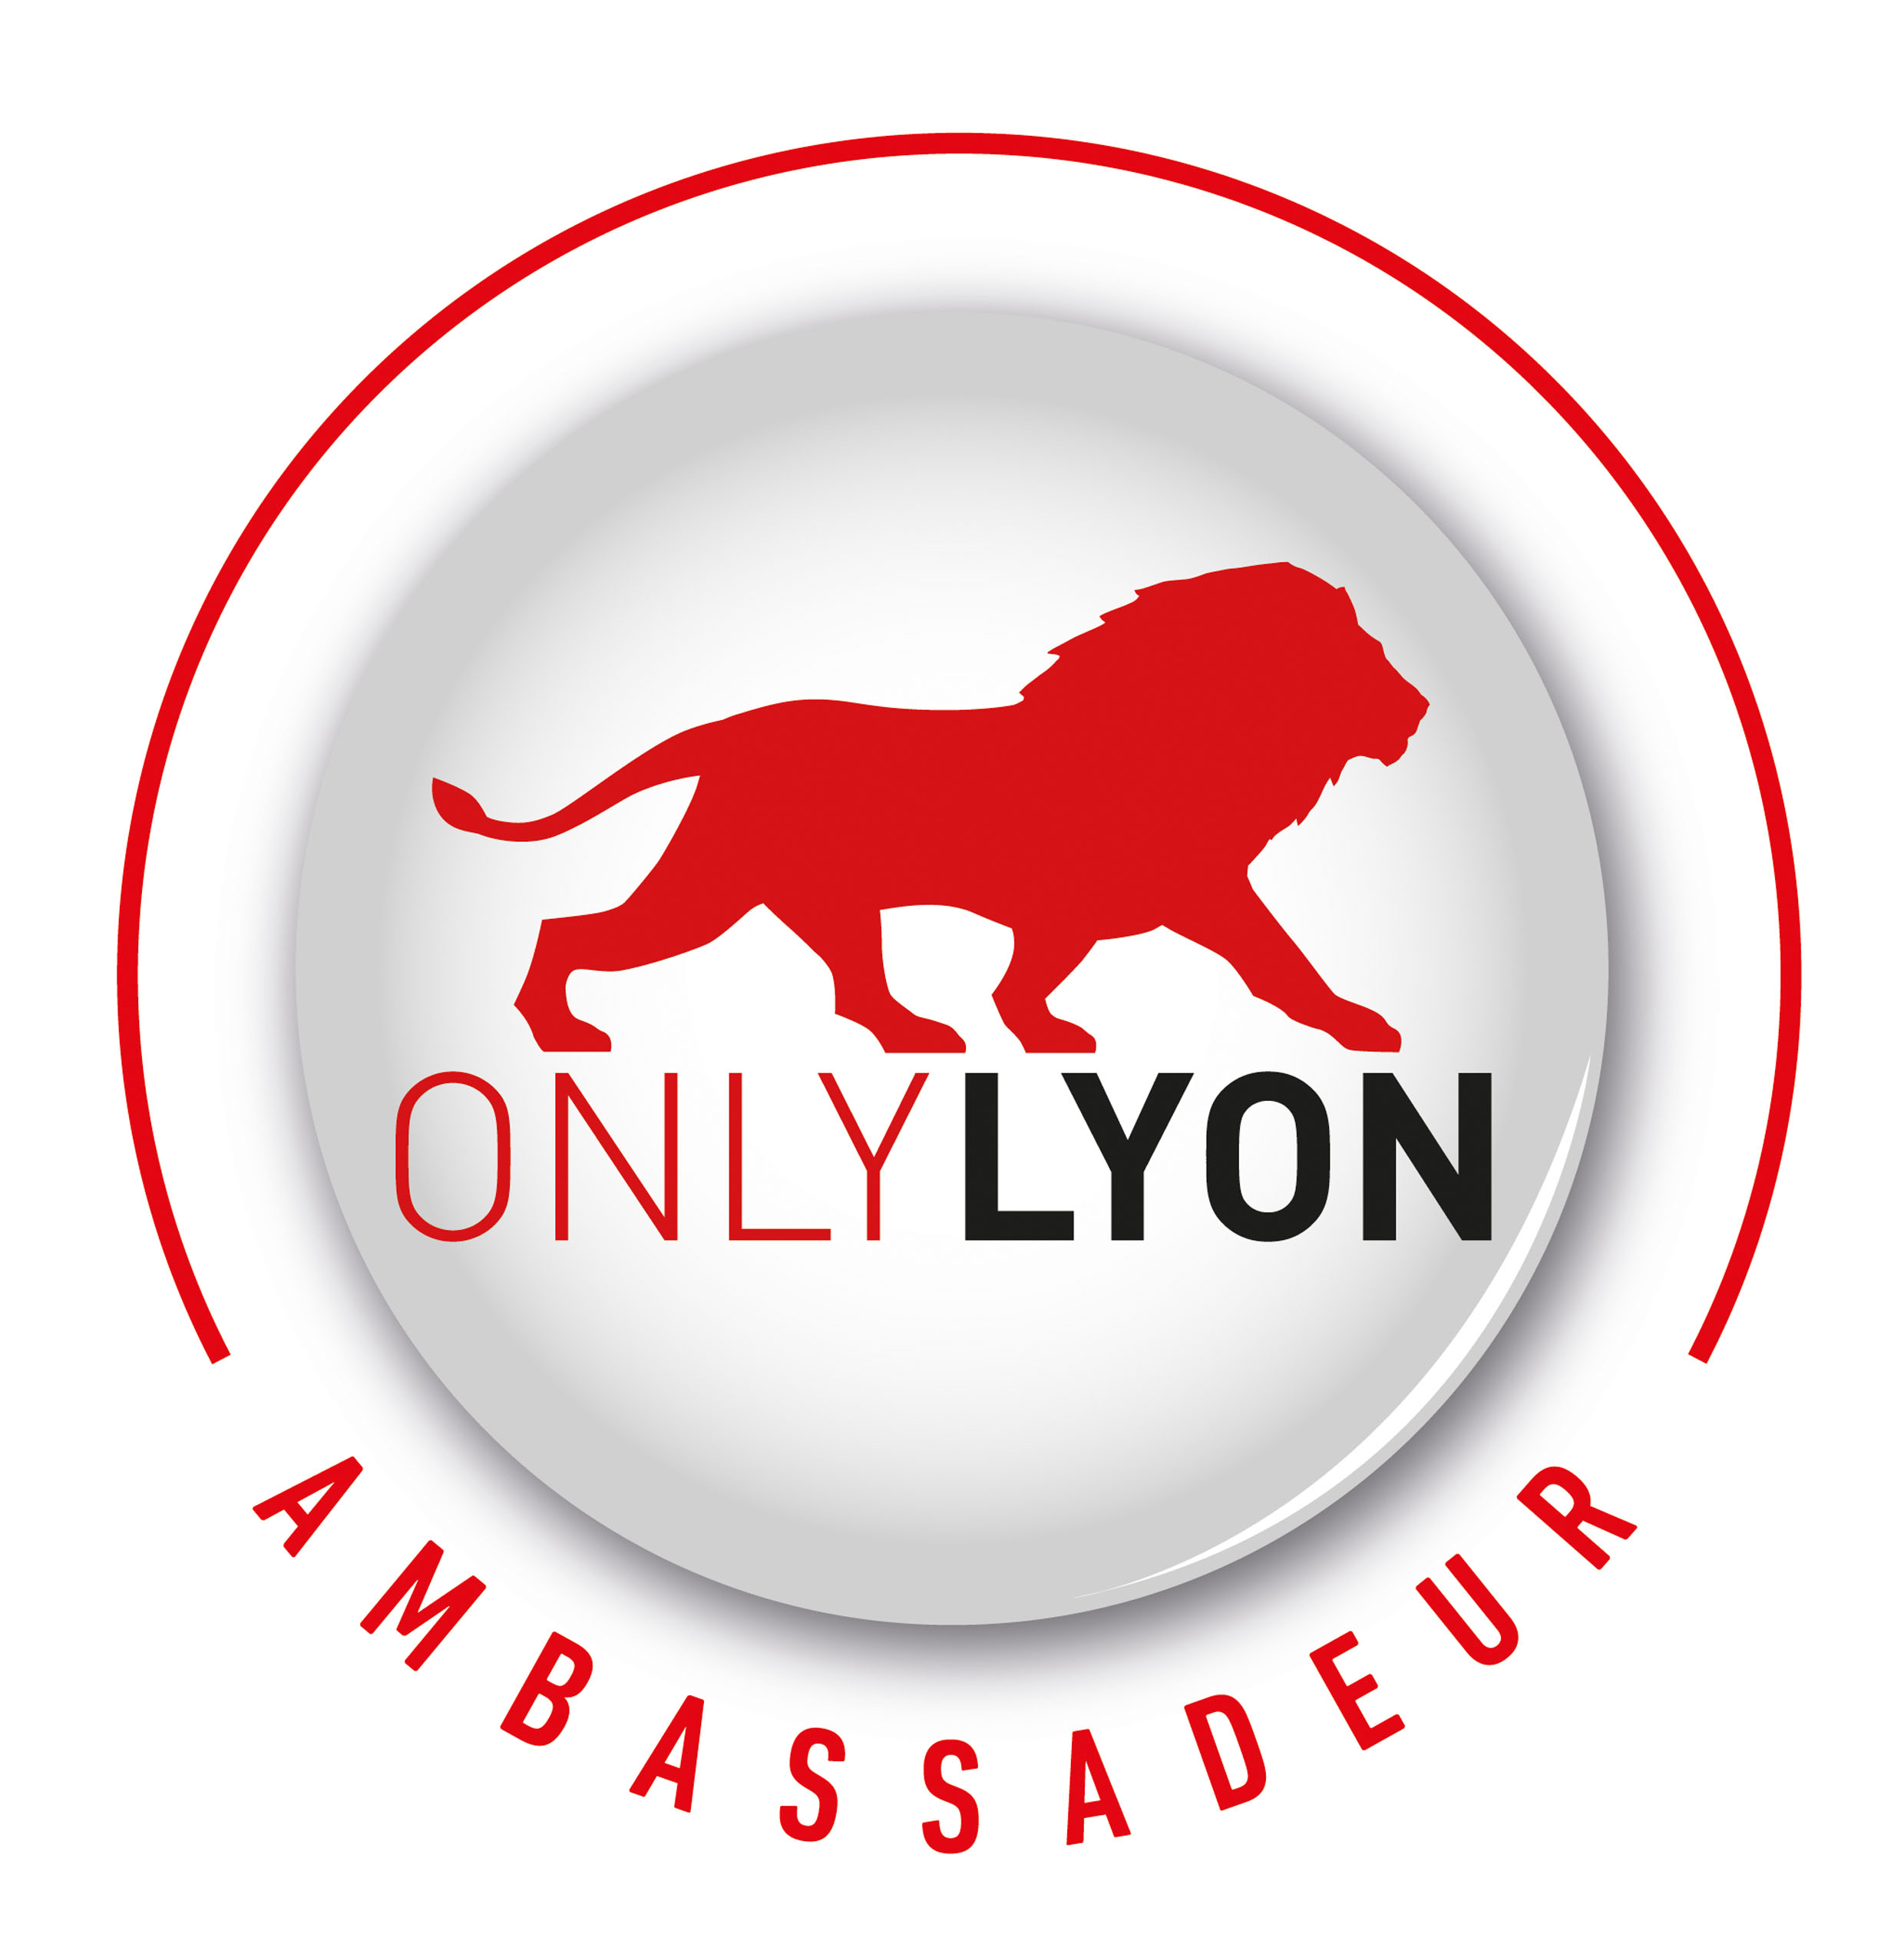 Faire rayonner Lyon à l'international